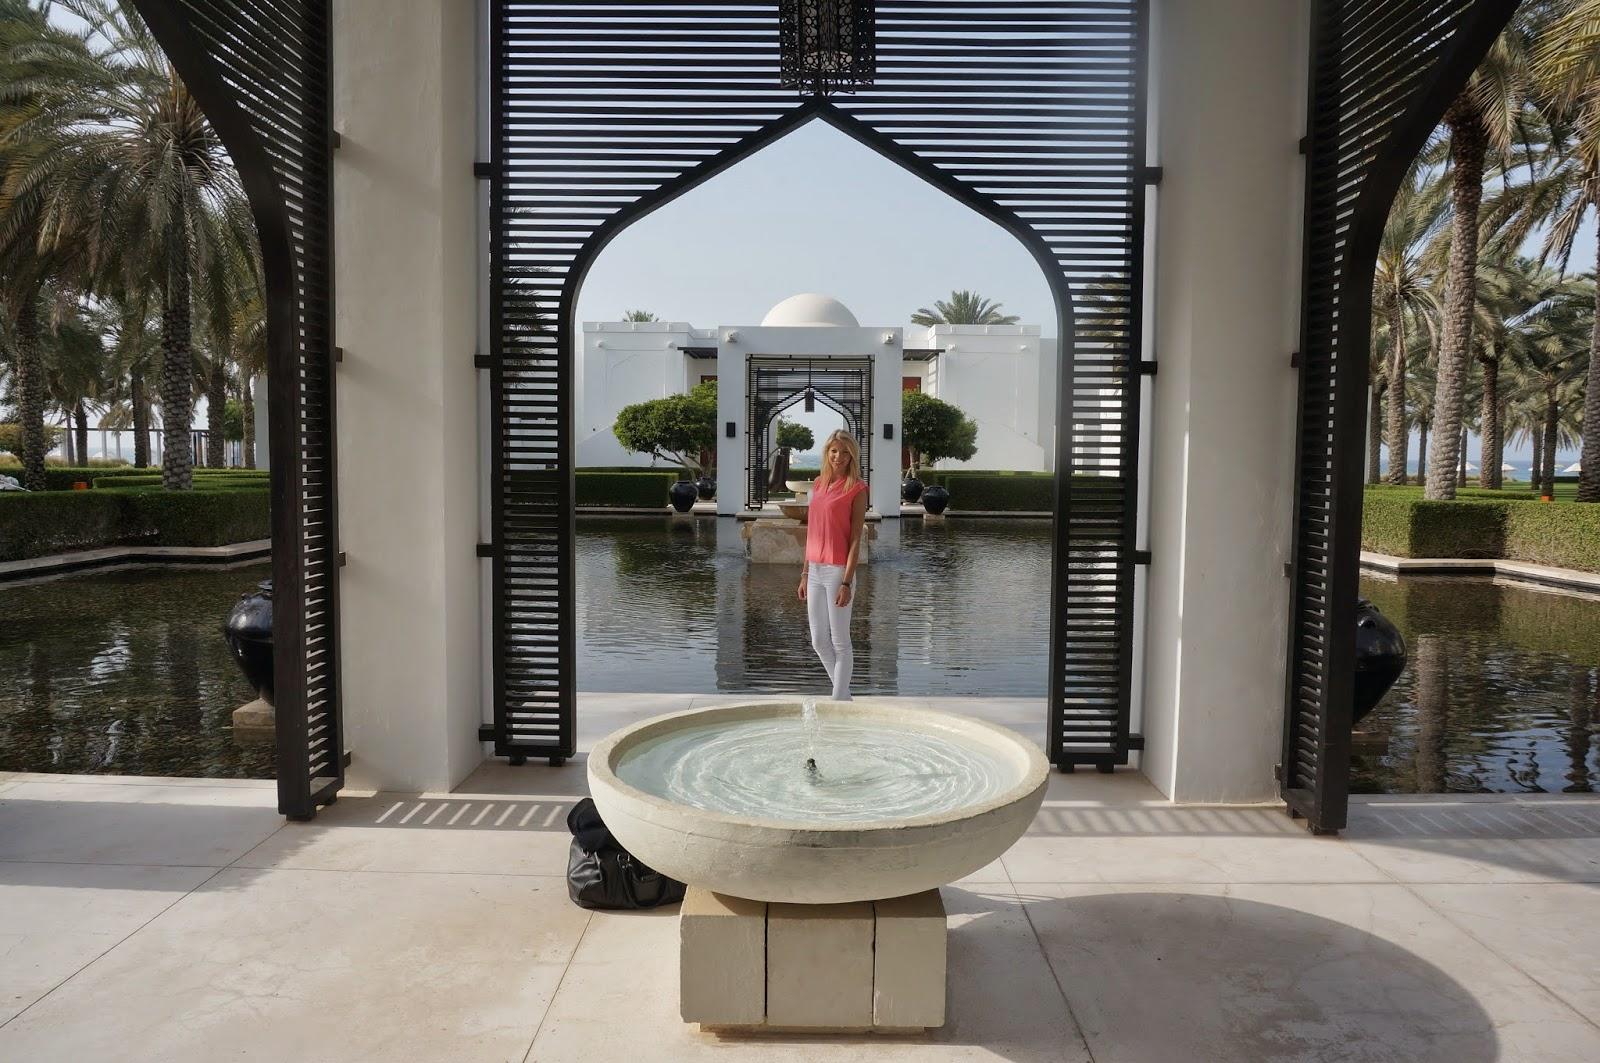 Romantic Muscat: Putting the 'Oman' in Romance